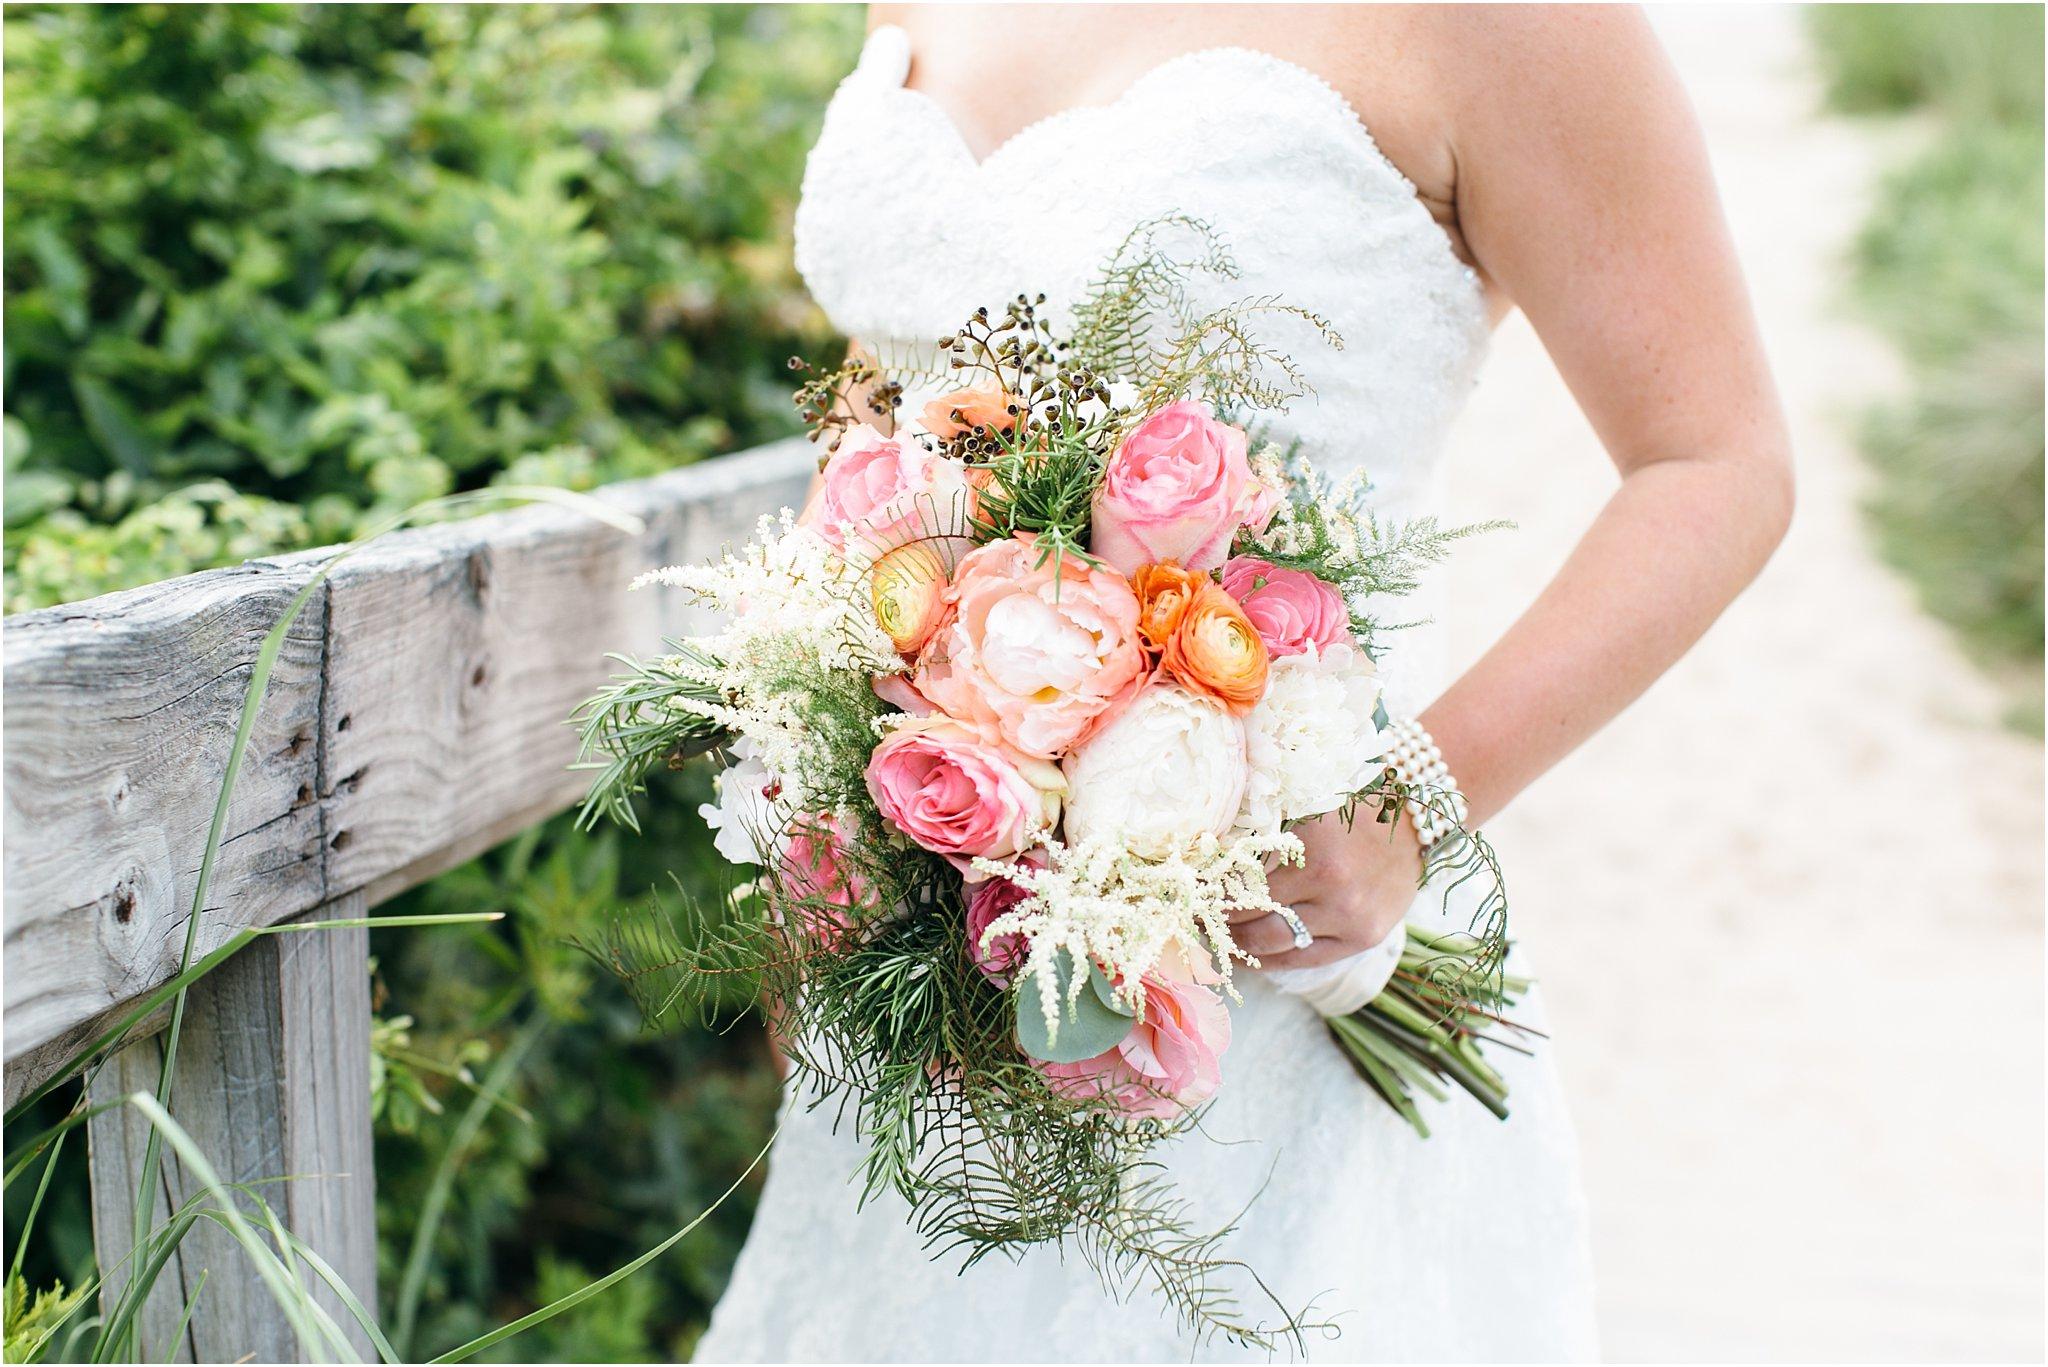 jessica_ryan_photography_wedding_photography_virginiabeach_virginia_candid_authentic_wedding_portraits_marina_shores_yacht_club_chesapeake_bay_1902